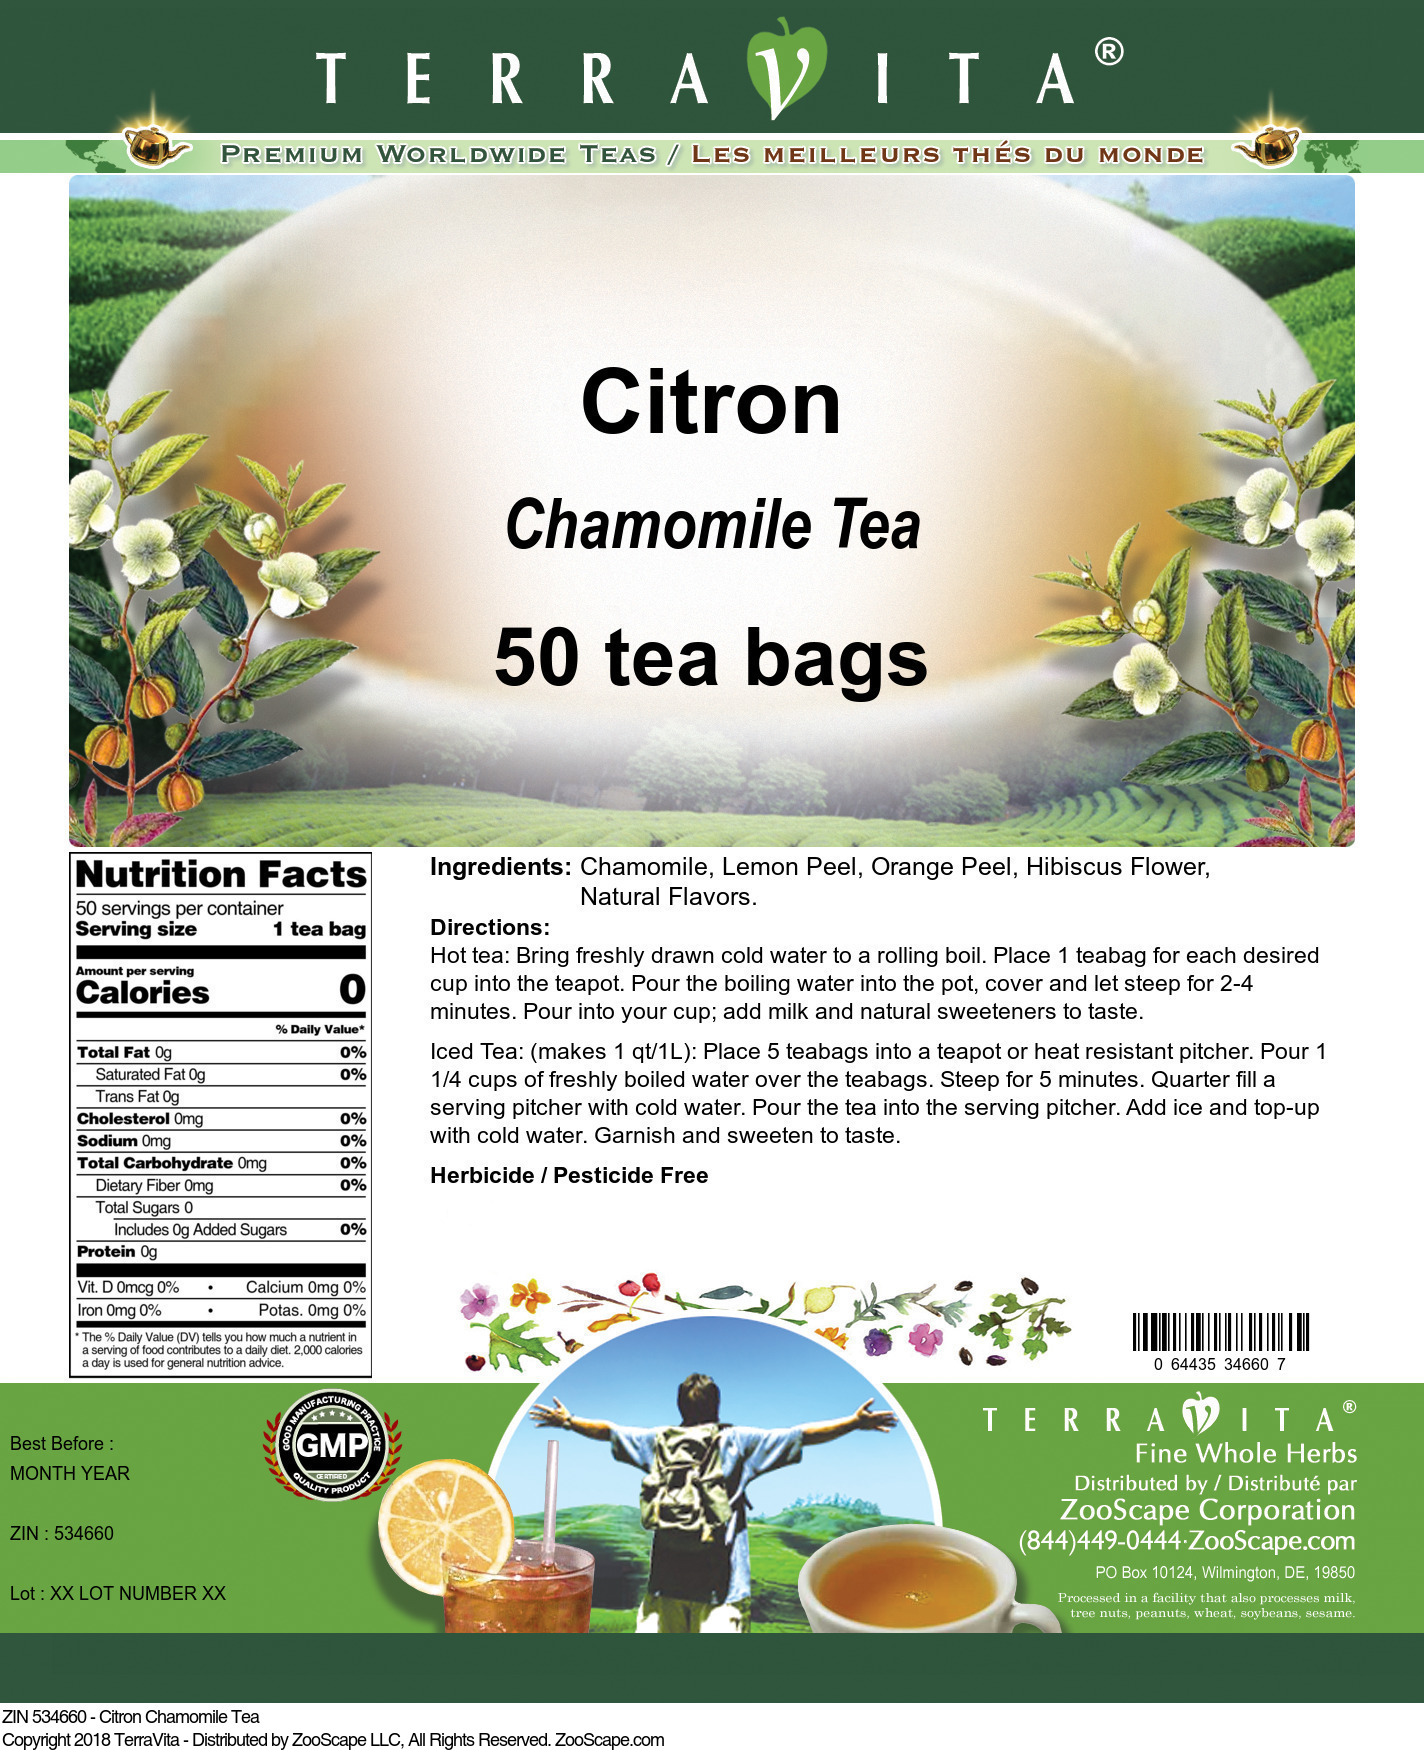 Citron Chamomile Tea